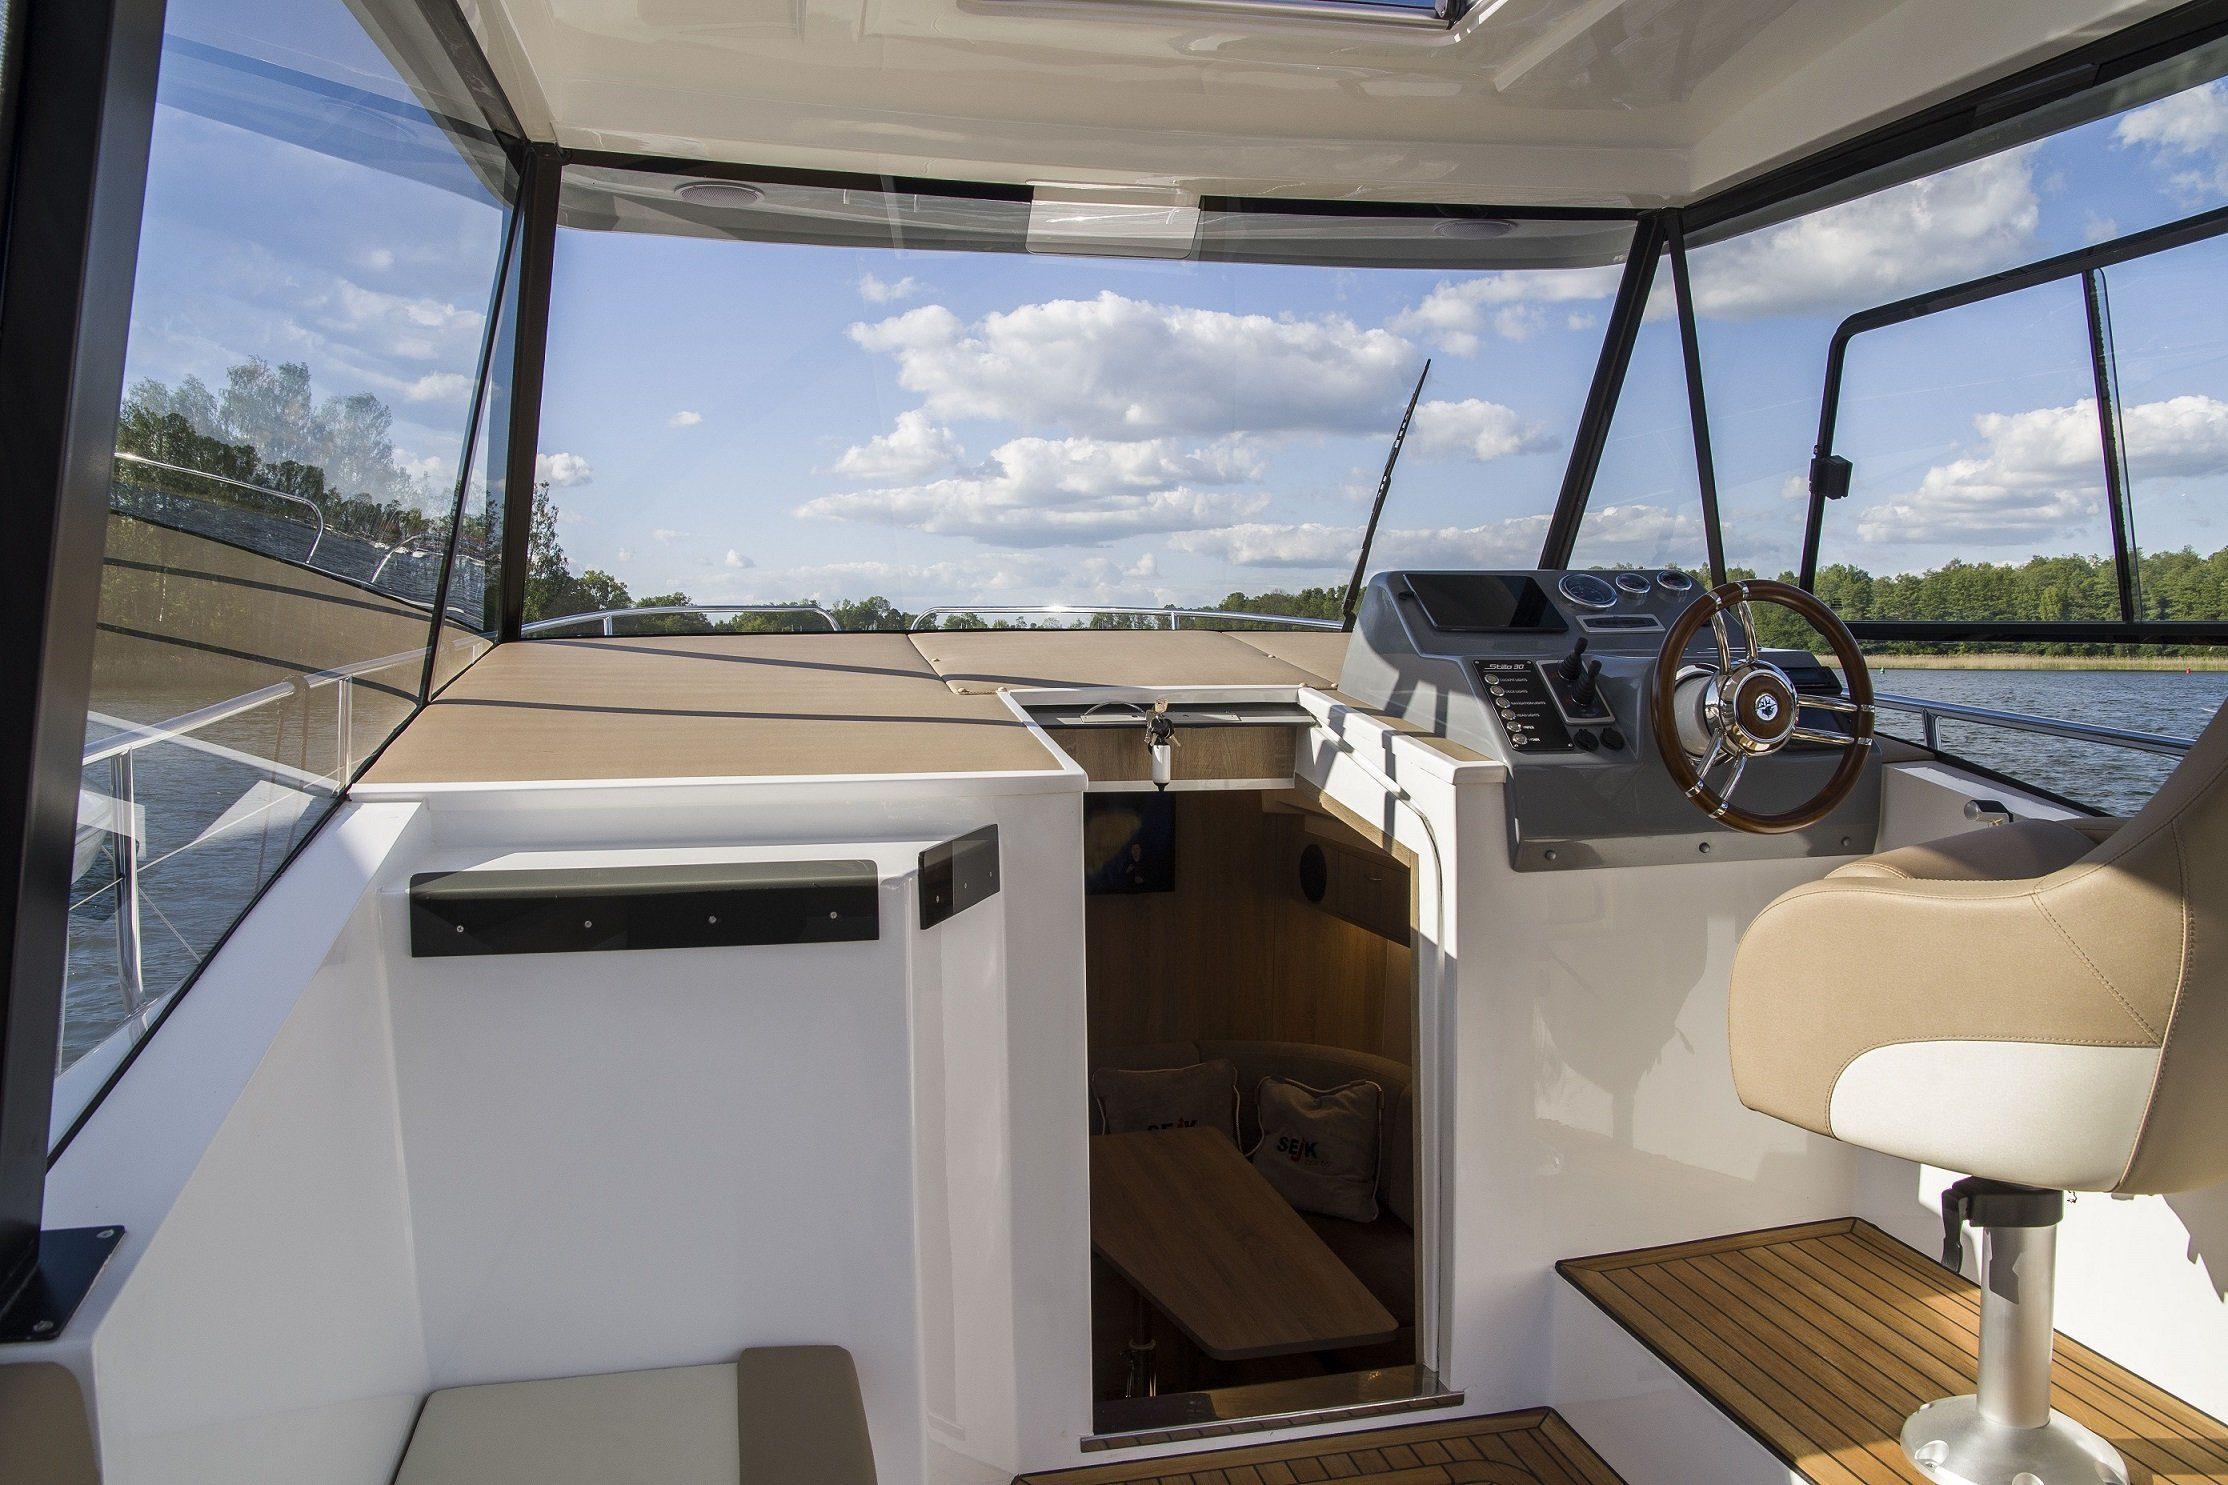 Stillo 30 luxury boat cockpit